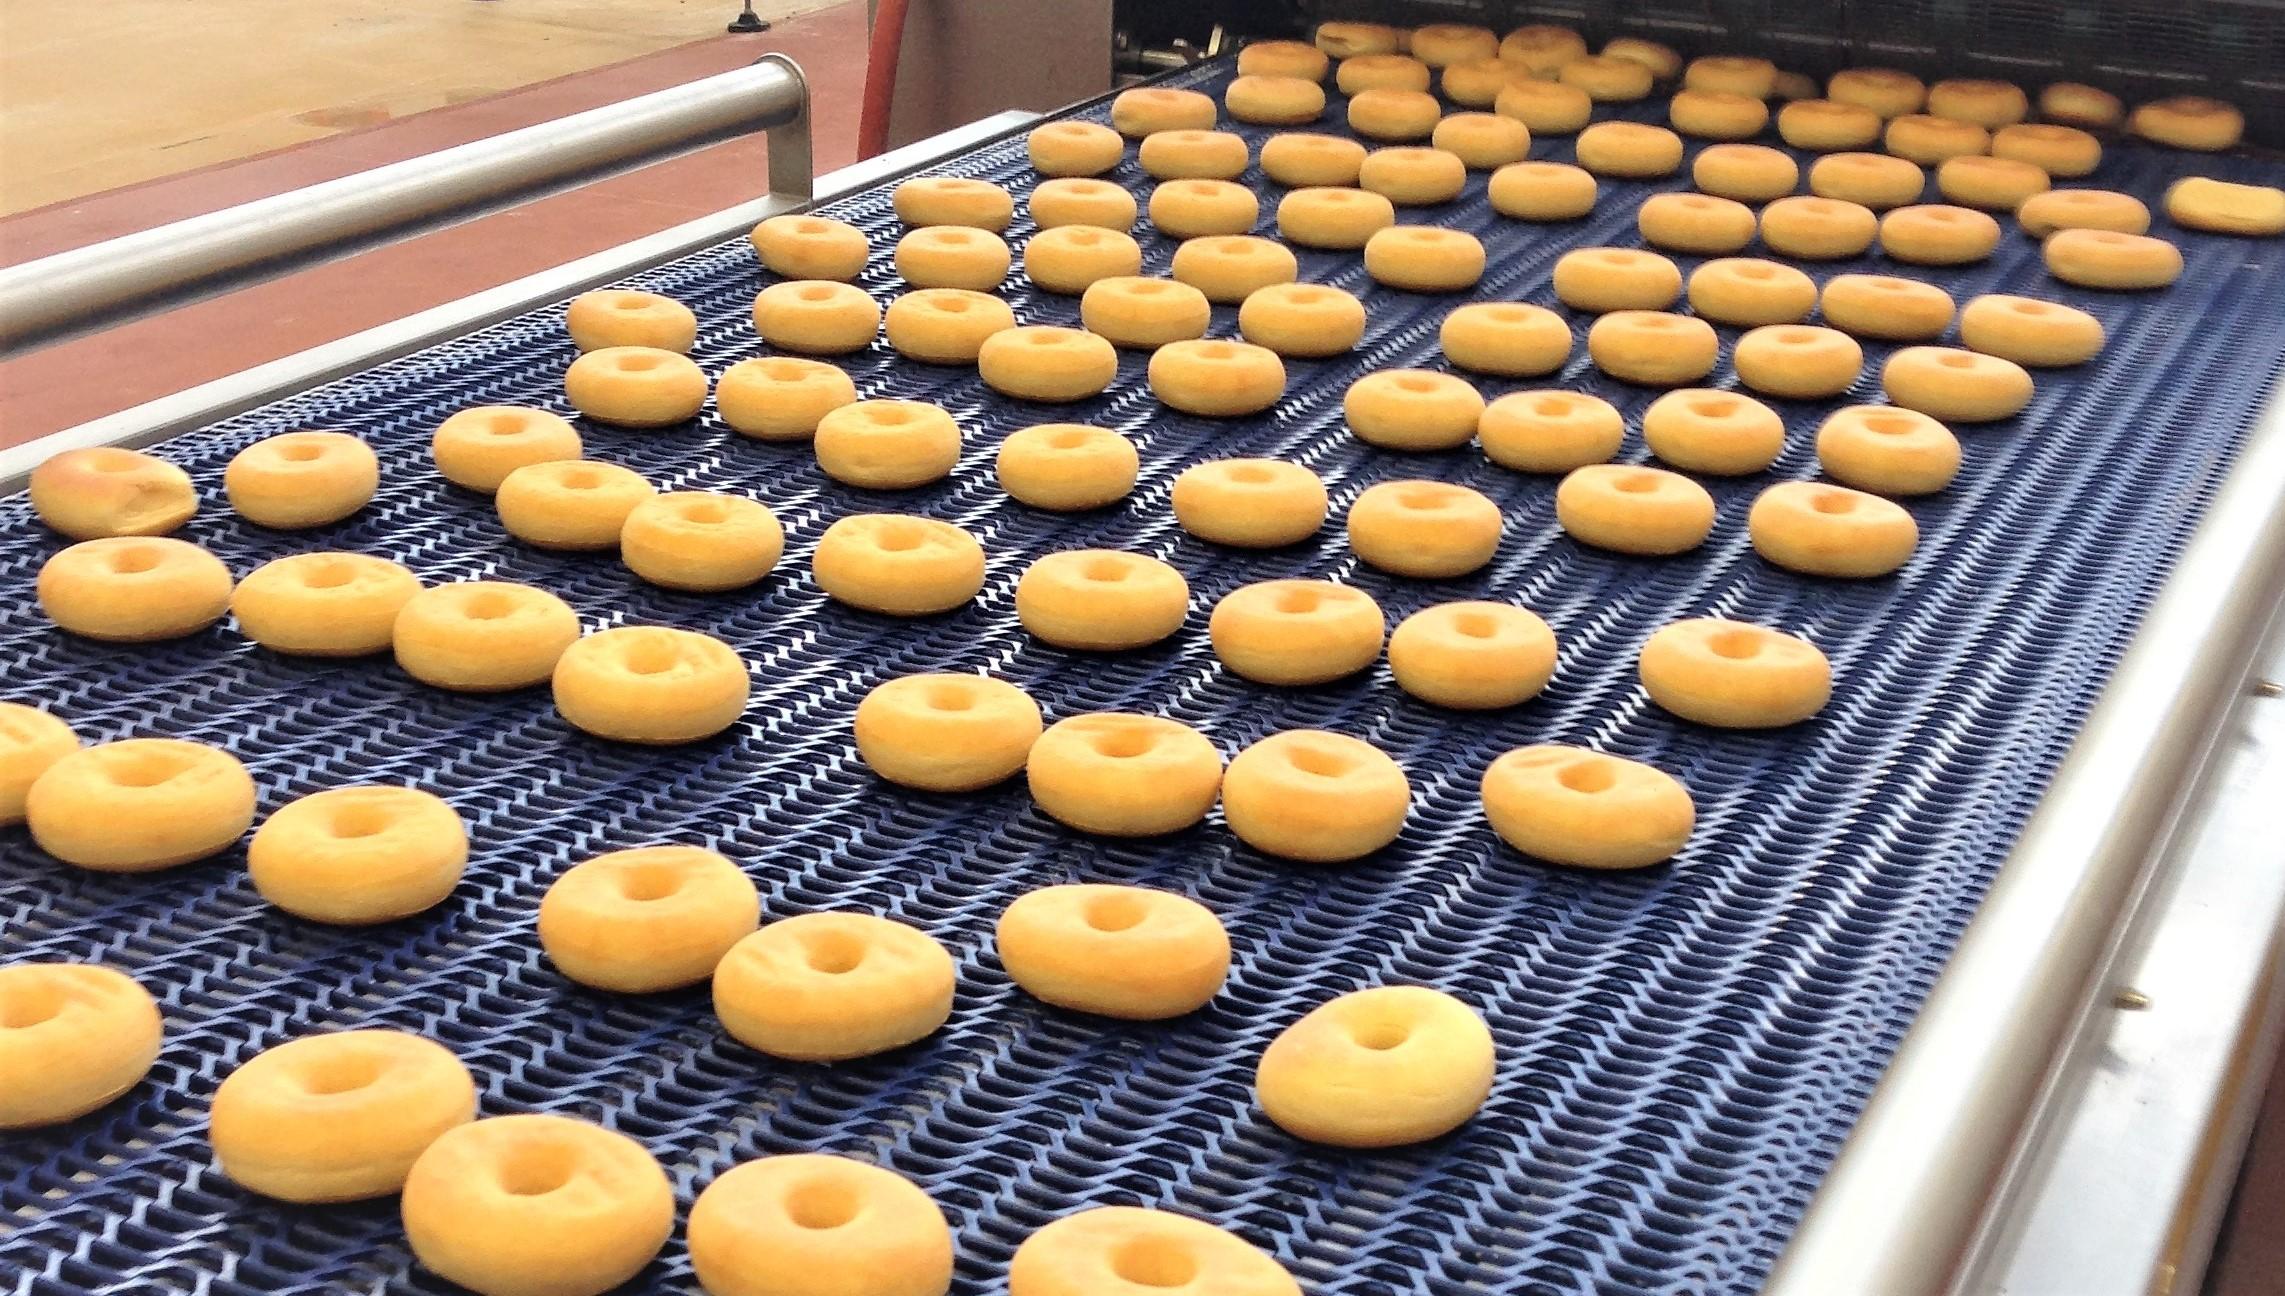 Doughnuts on a conveyor belt